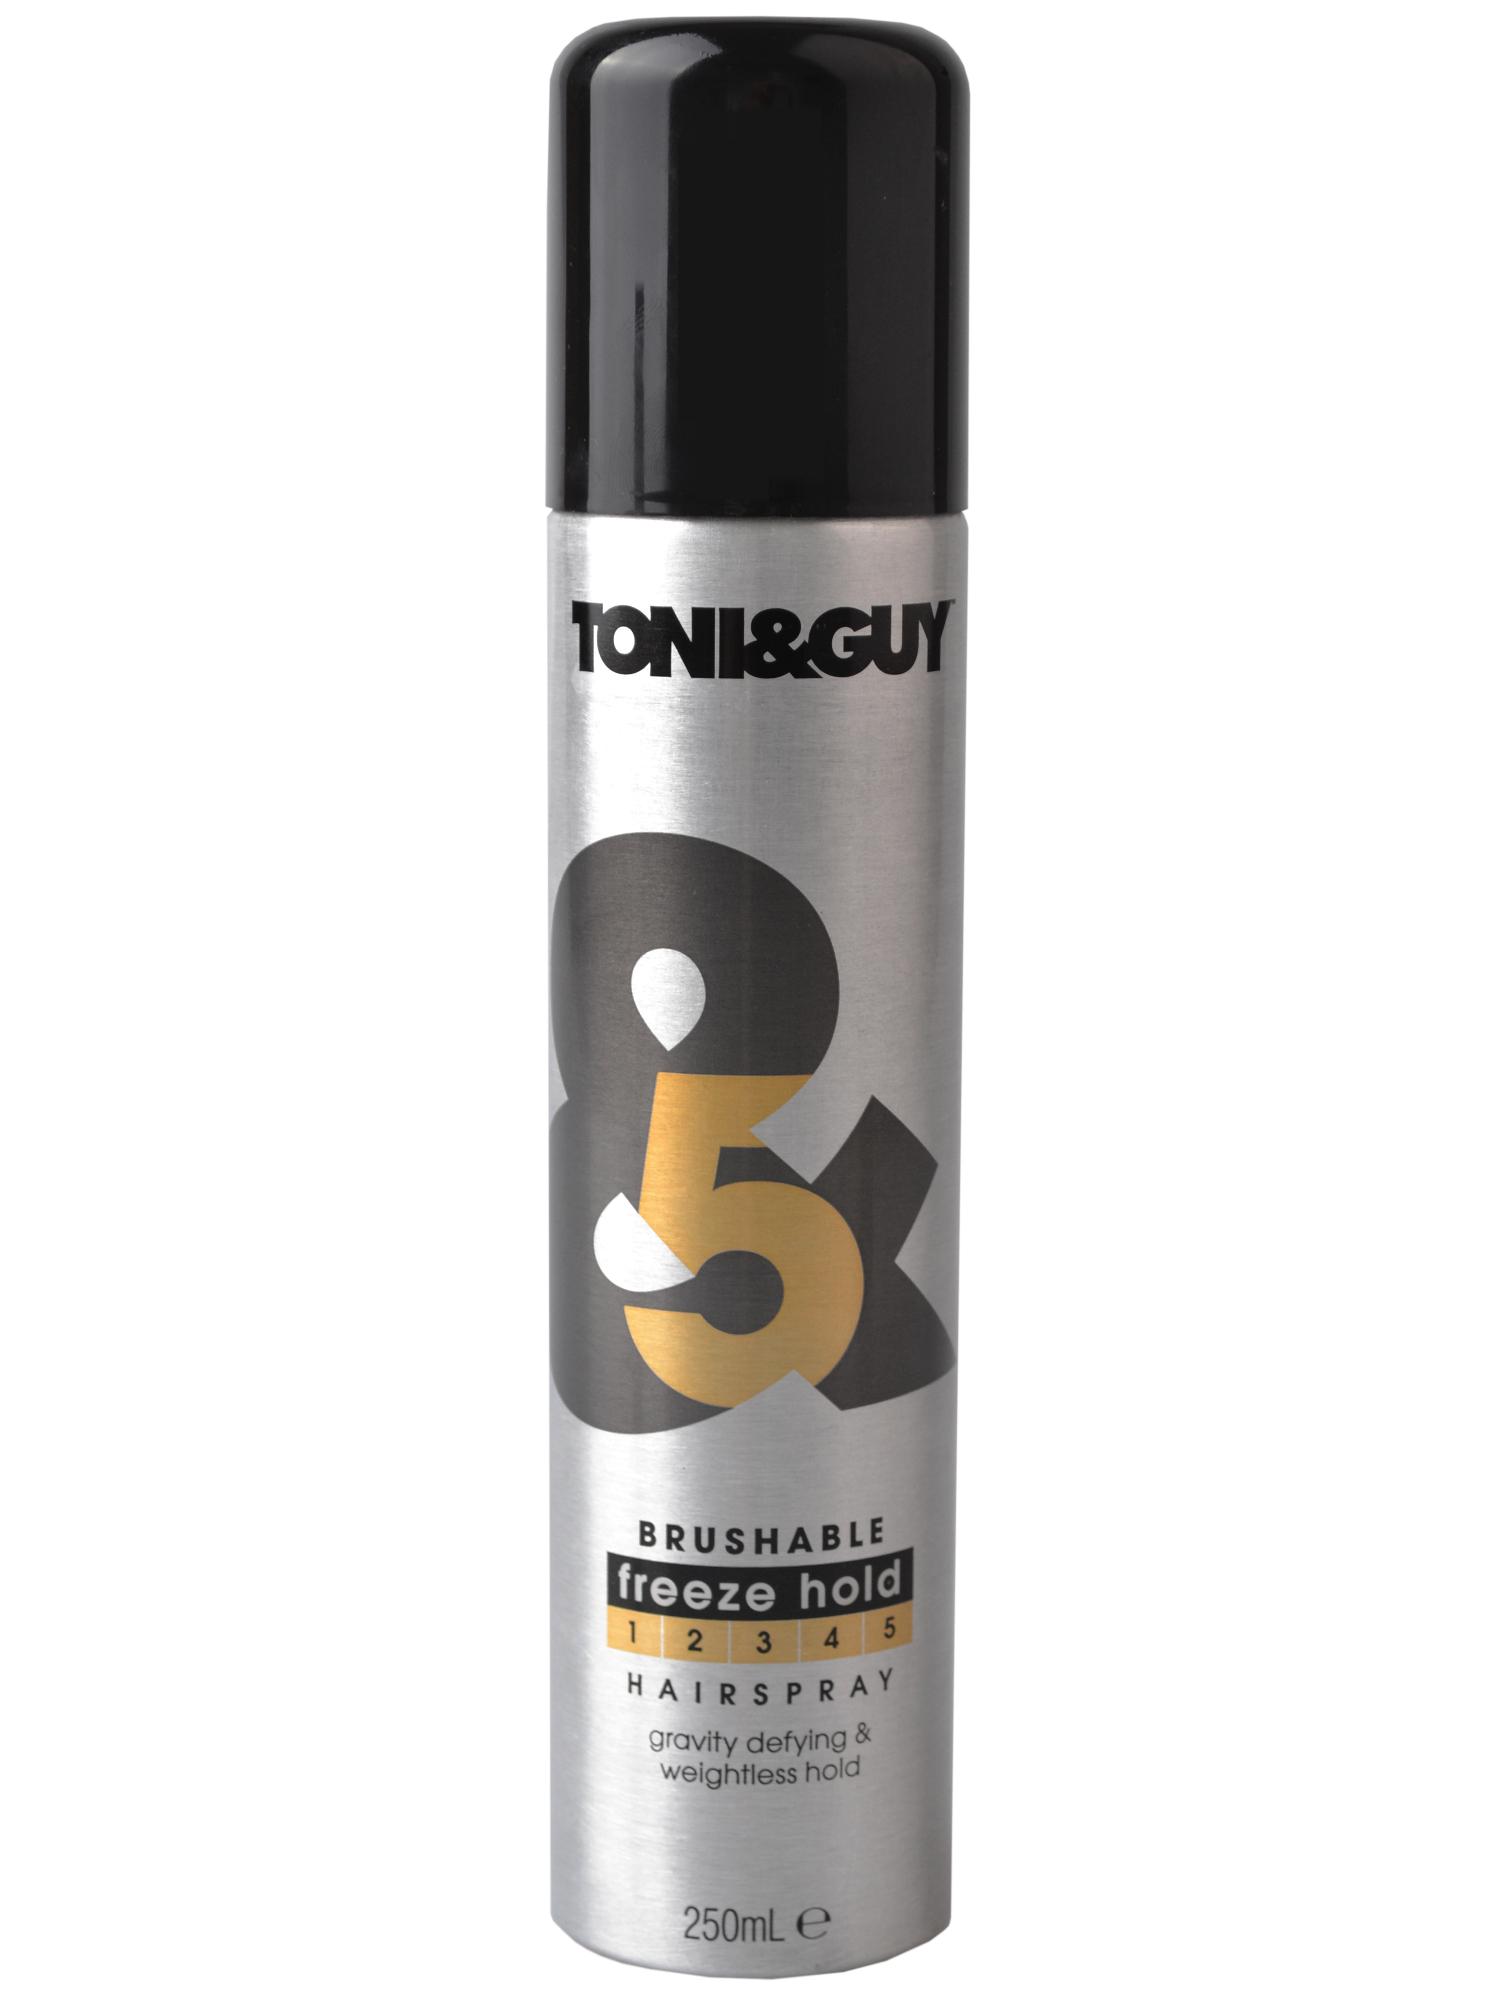 Lak na vlasy s extrémní fixací Toni a Guy Extreme Style Creation - 250 ml (9204859, ULTG9206444) - T